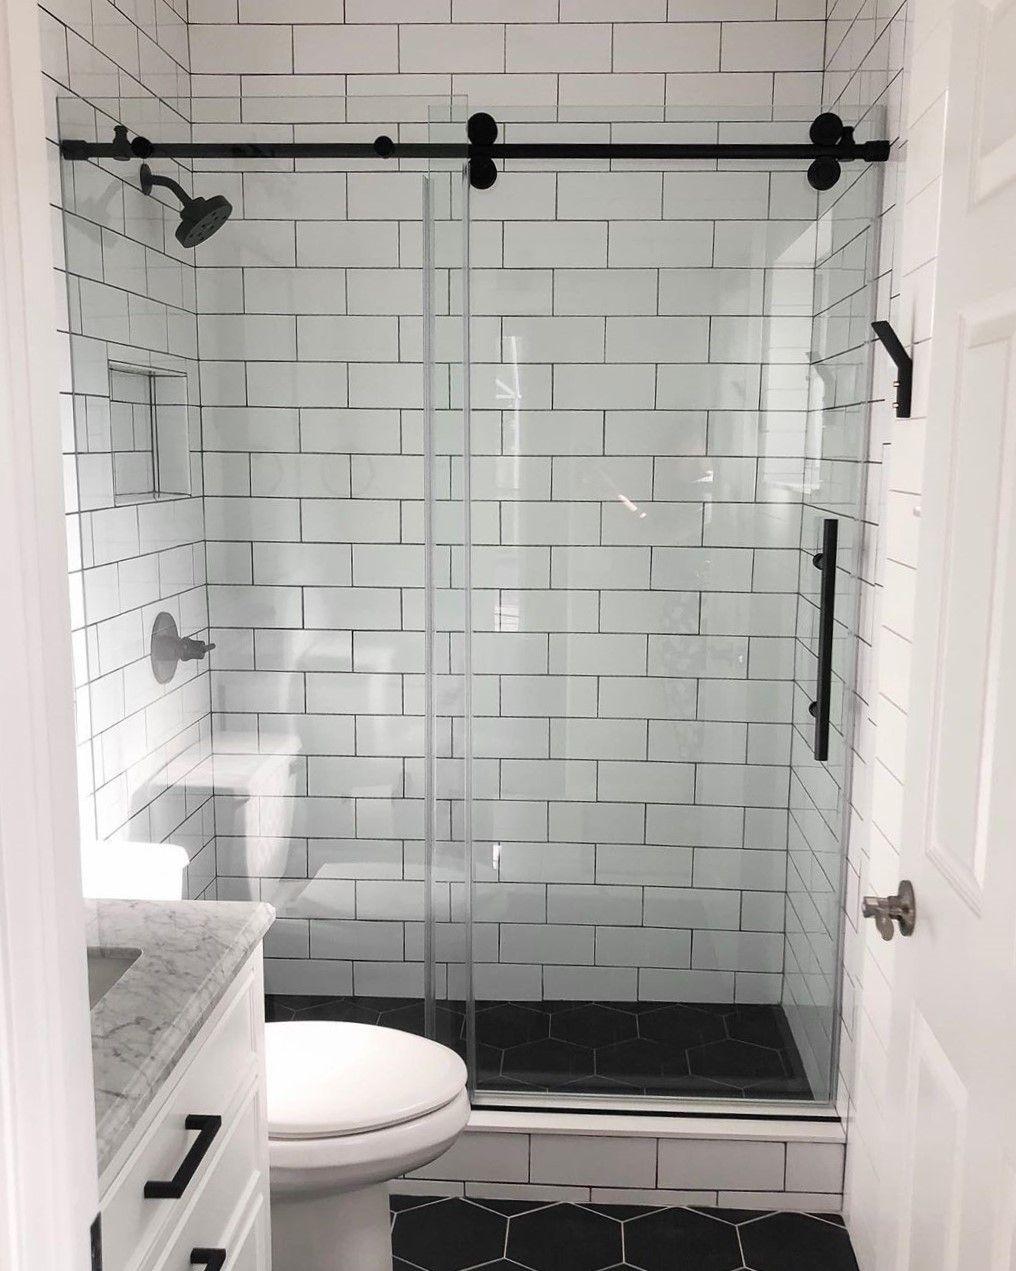 A Dreamline Frameless Glass Shower Door With Trending Black Accents In This Modern Bathroom Design In 2020 Shower Doors Sliding Shower Door Modern Bathroom Design